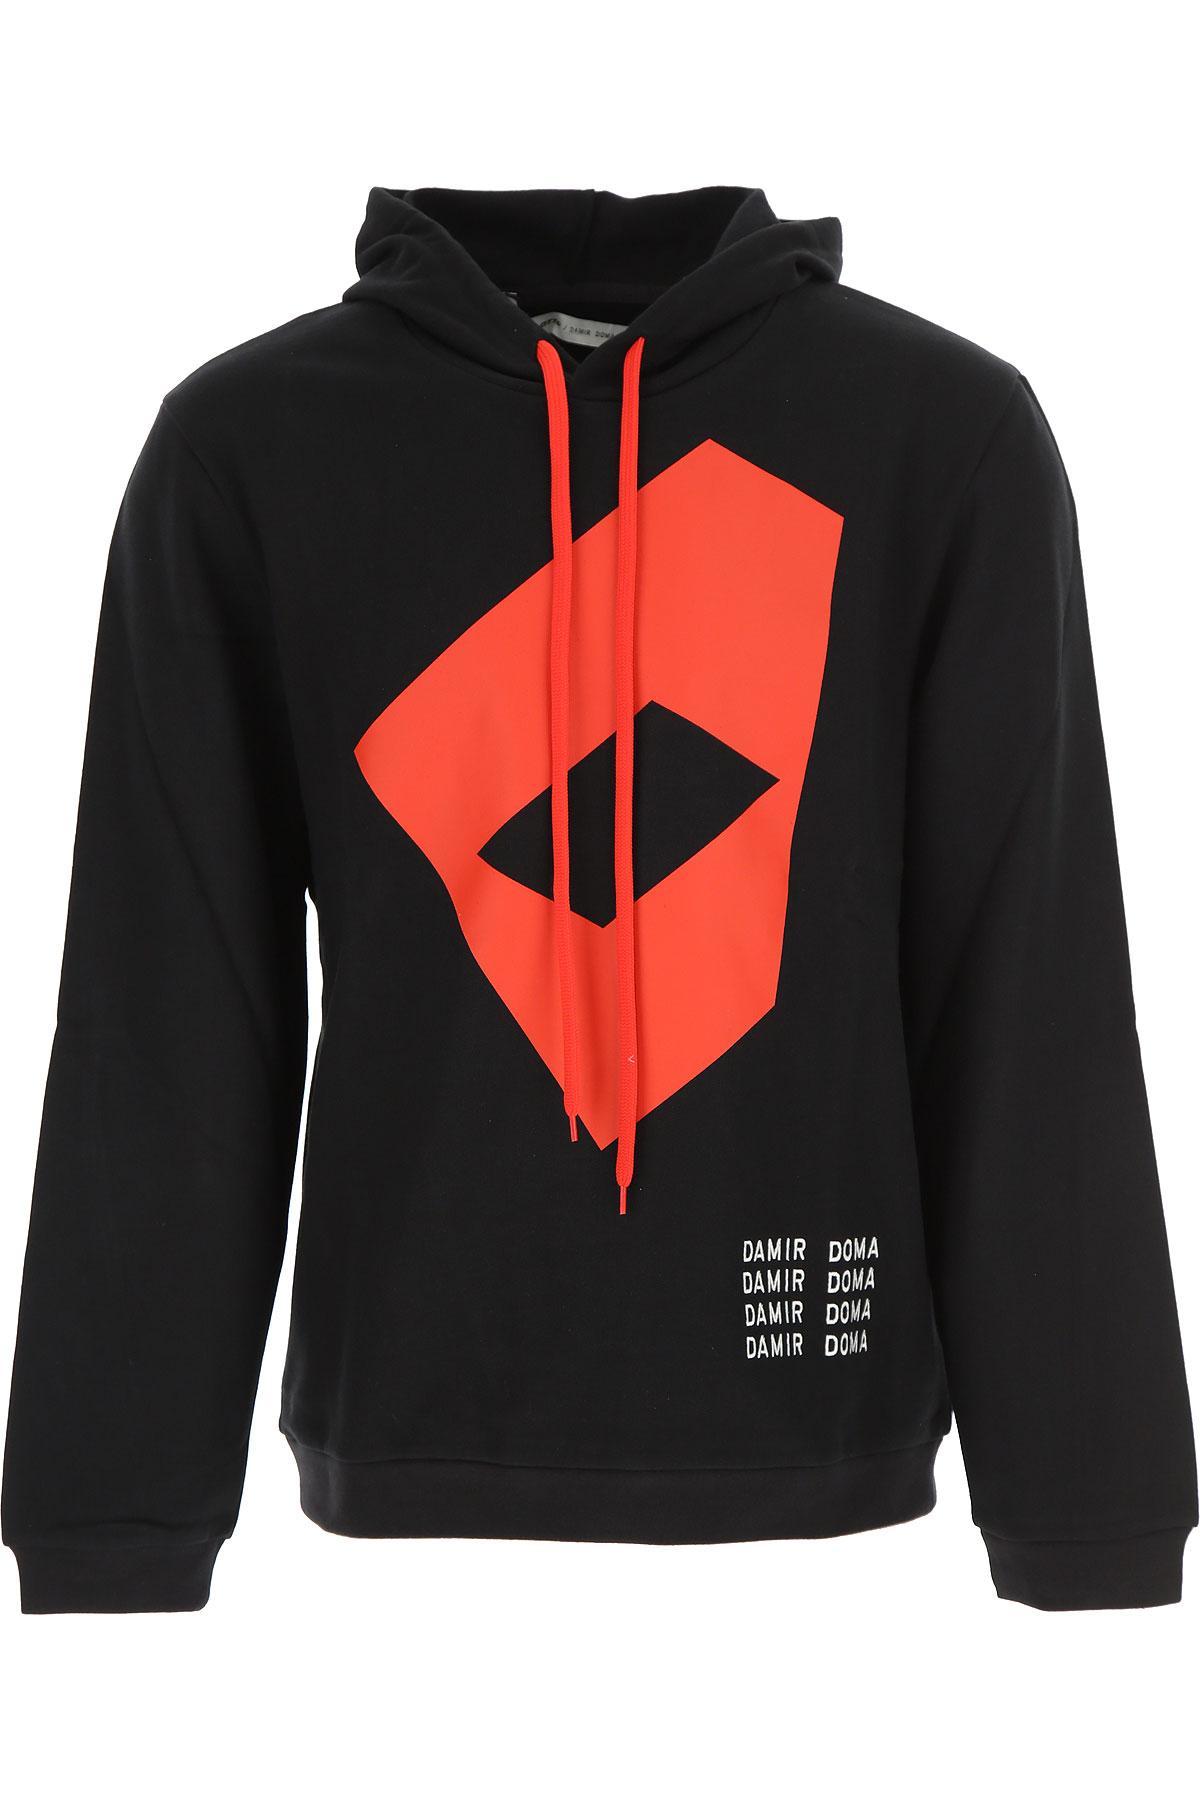 Image of Damir Doma Sweatshirt for Men, Black, Cotton, 2017, L M S XL XS